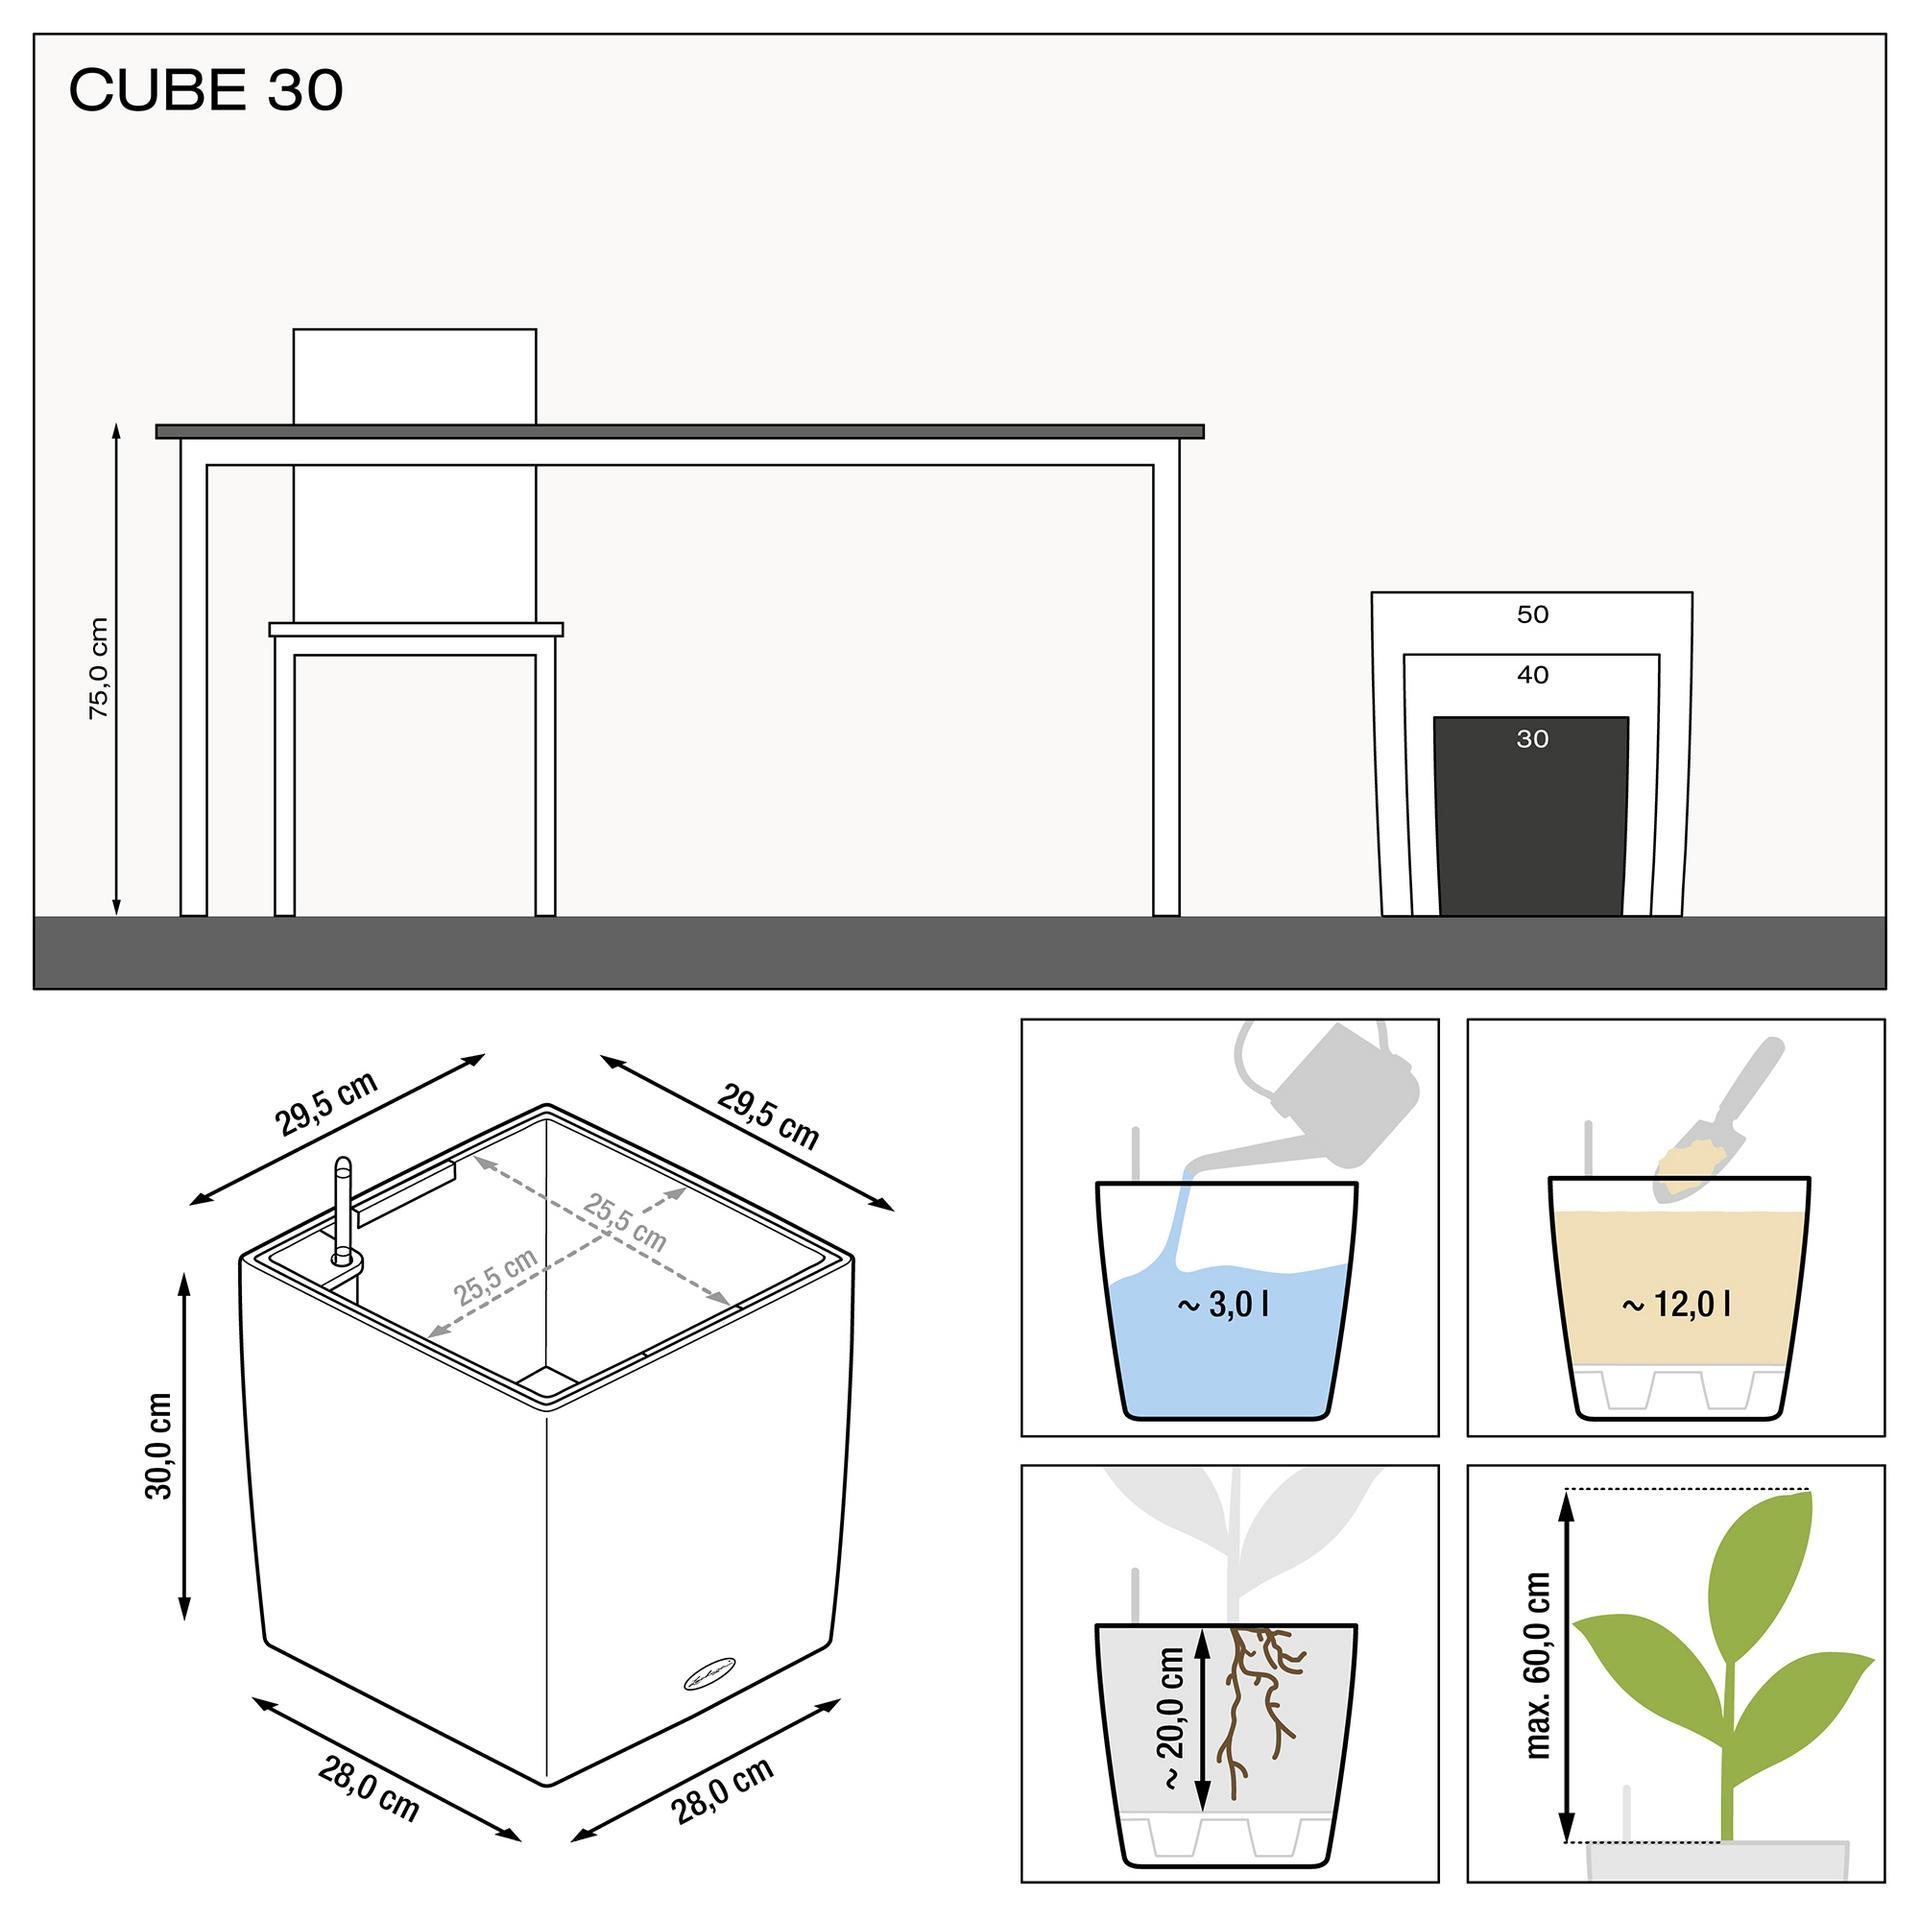 le_cube30_product_addi_nz